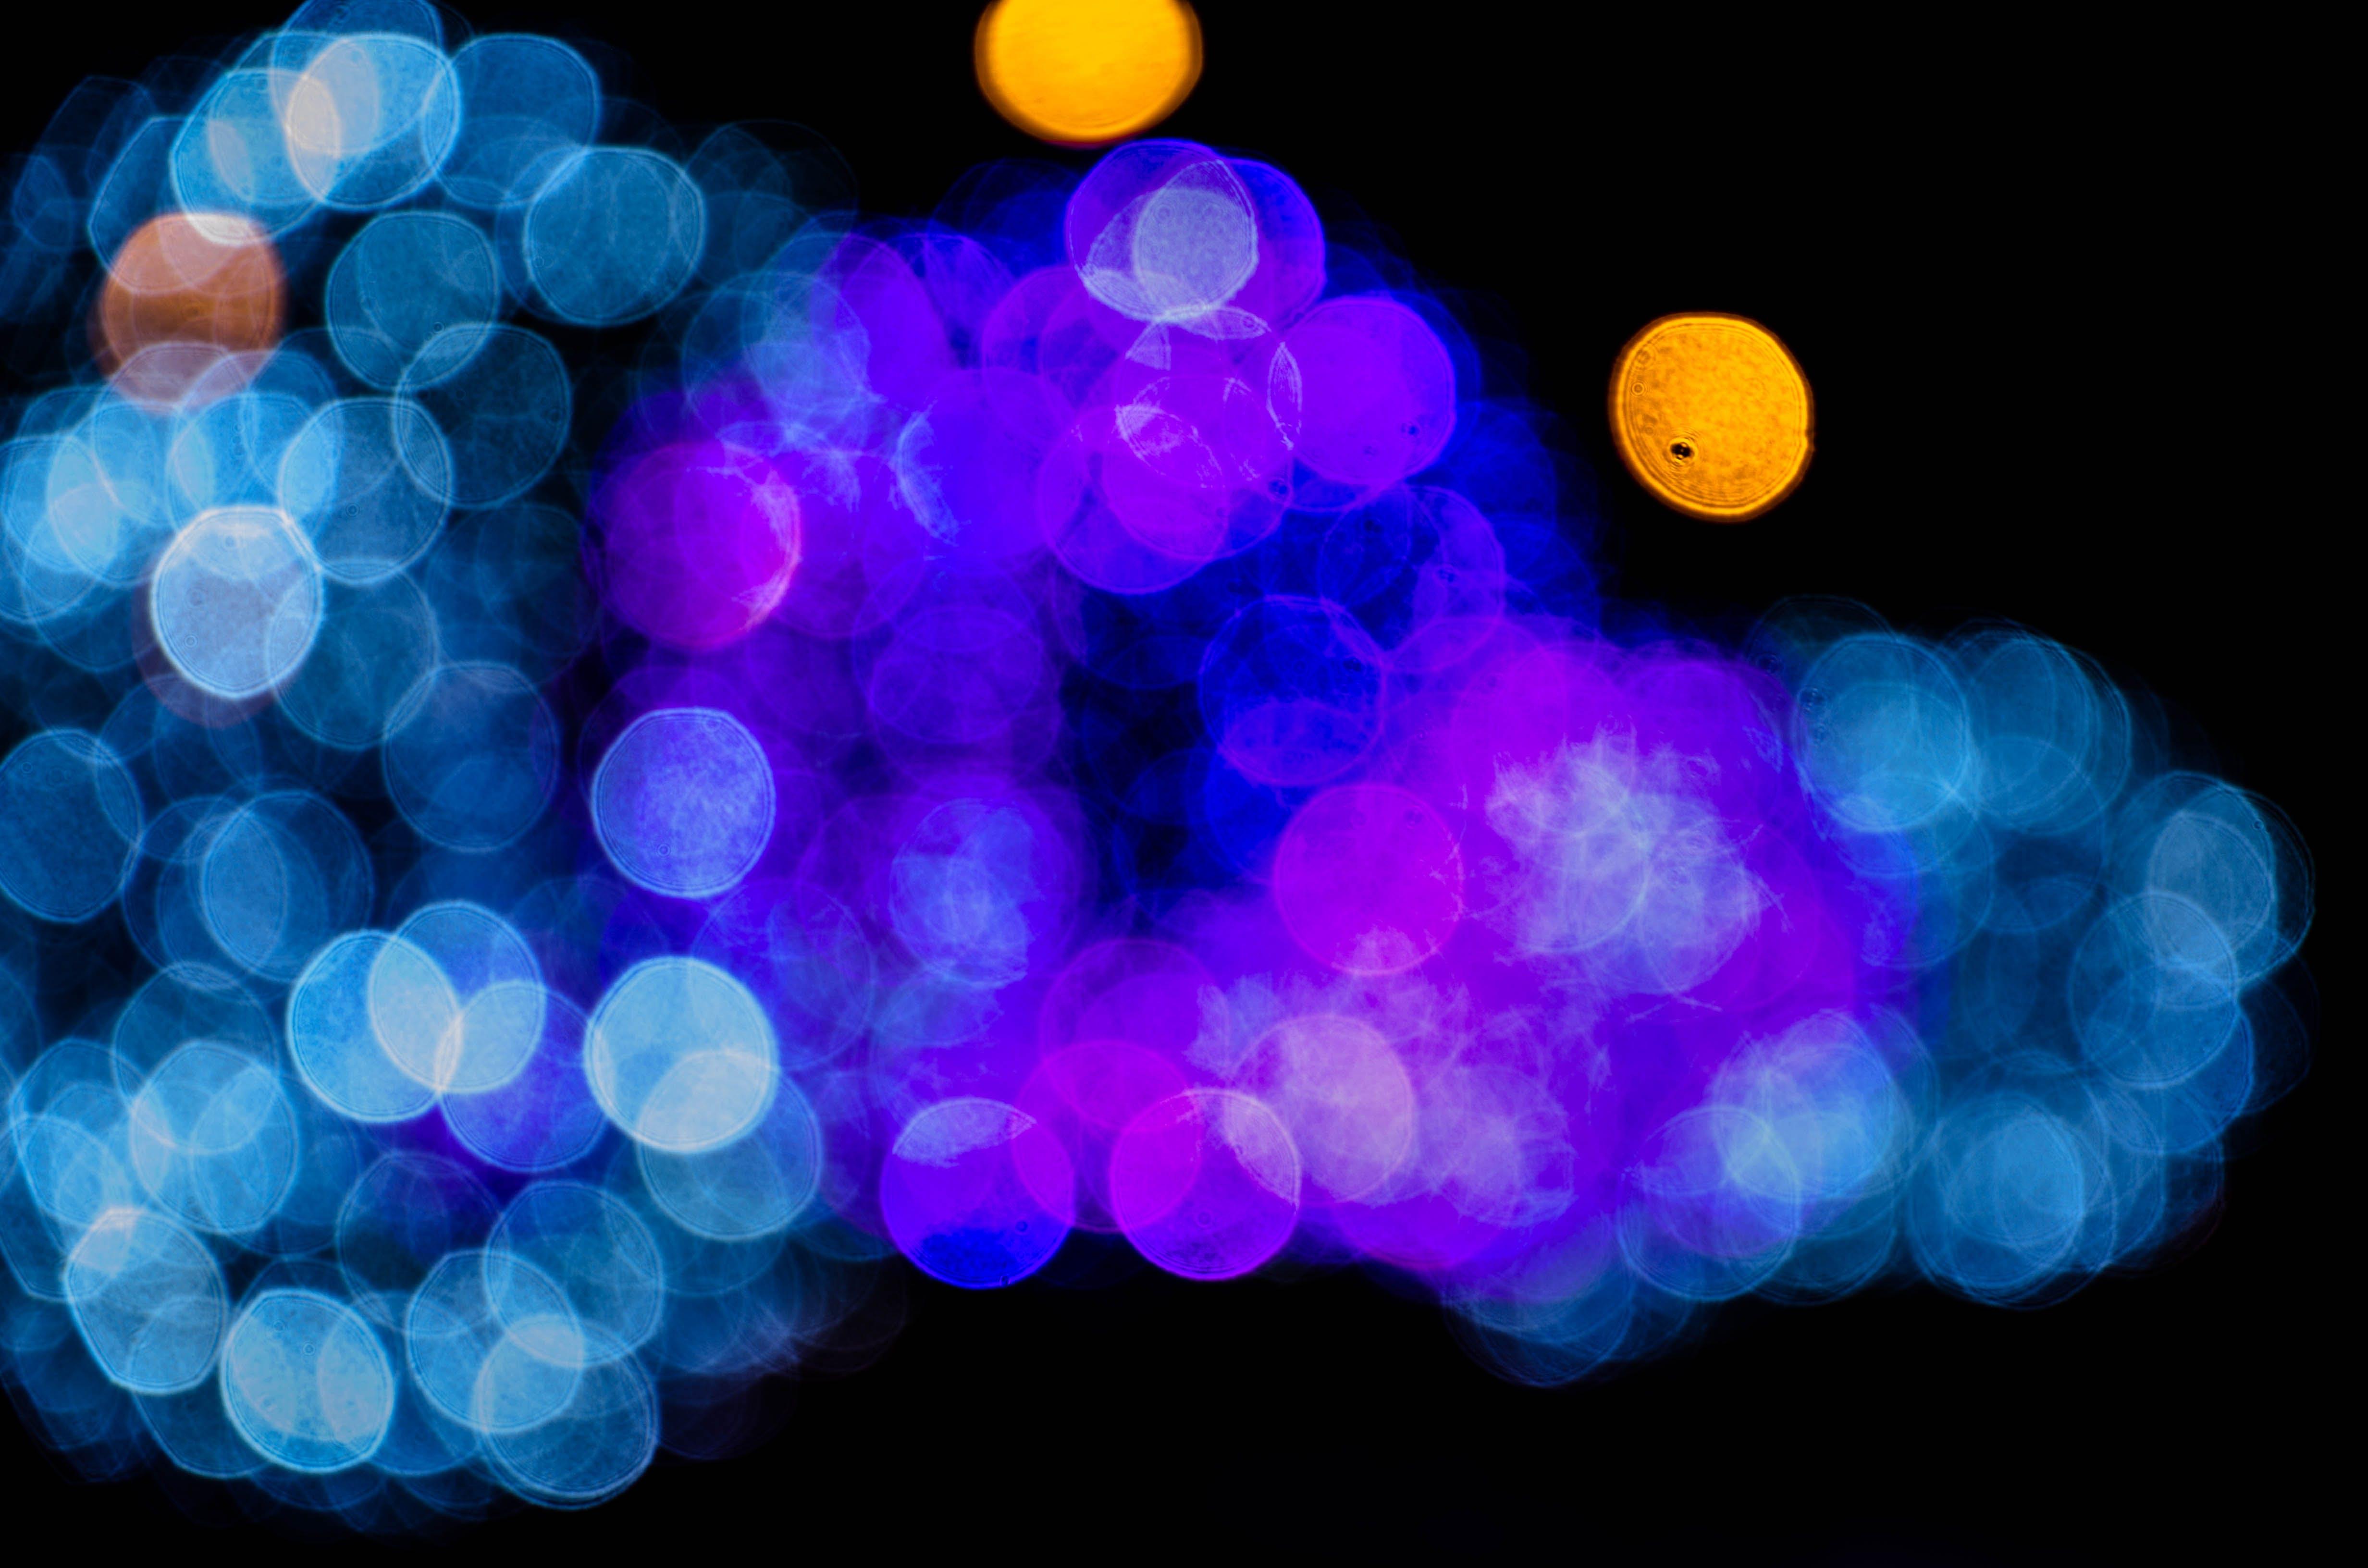 Kostenloses Stock Foto zu beleuchtet, beleuchtung, bokeh, verschwommen